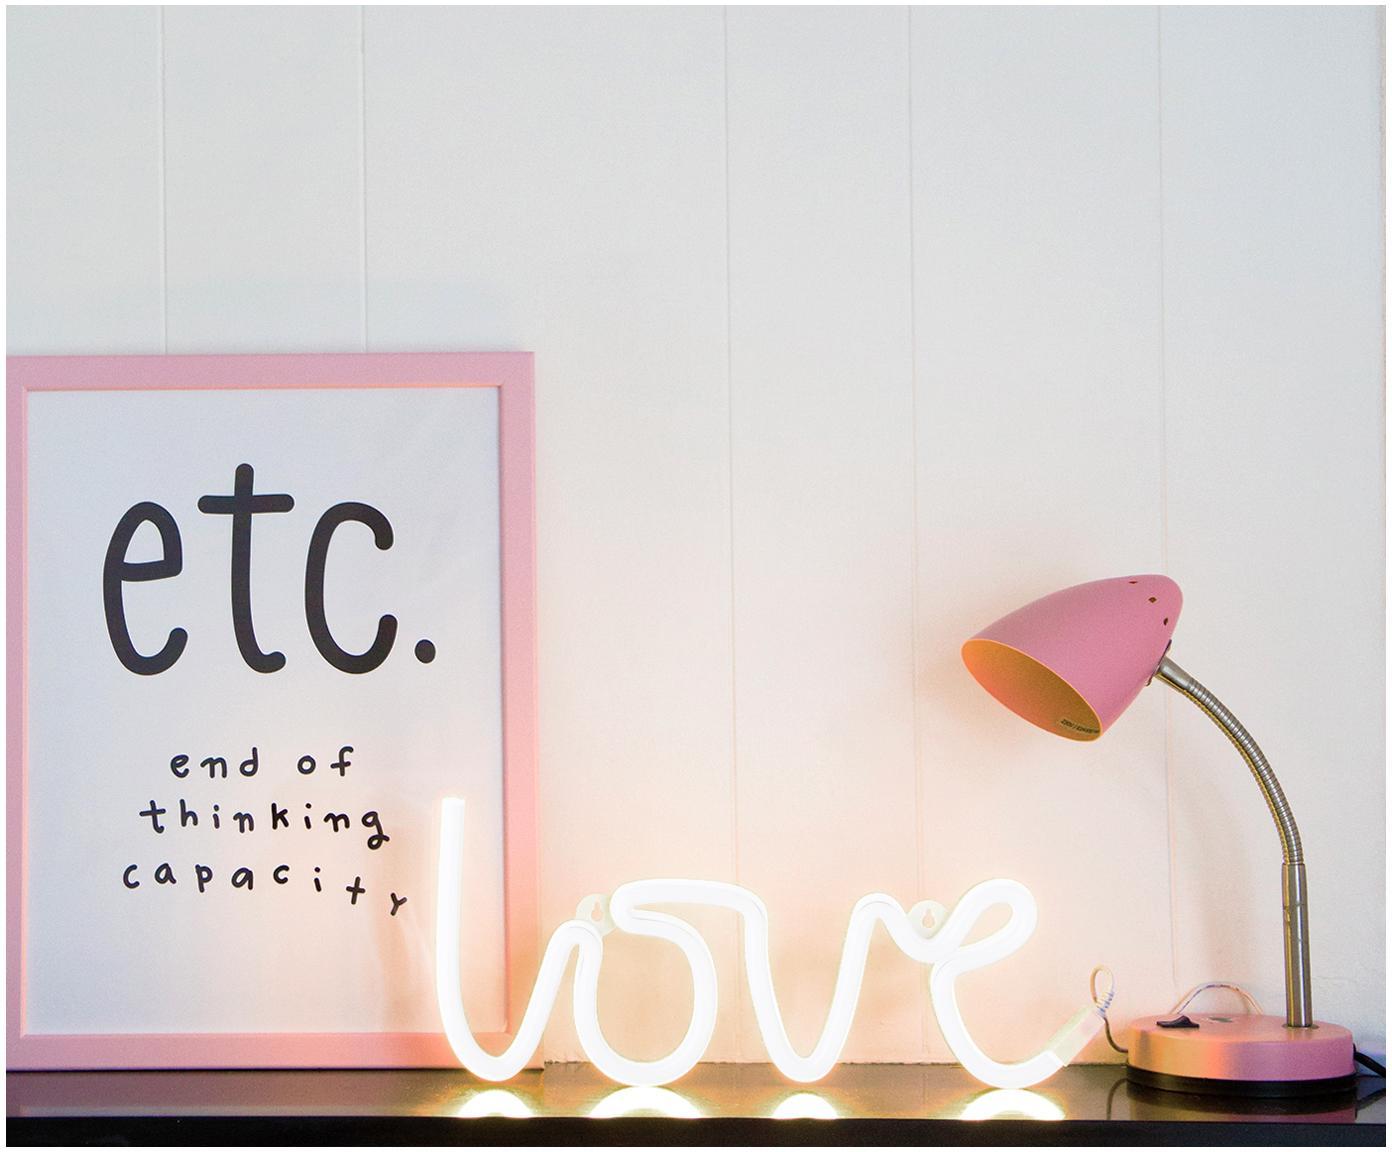 Wandlamp Love met stekker, Lamp: BPA-vrij PVC, Lichtkleur: geel. Wanneer uitgeschakeld, wordt het LED lampje wit., 38 x 16 cm